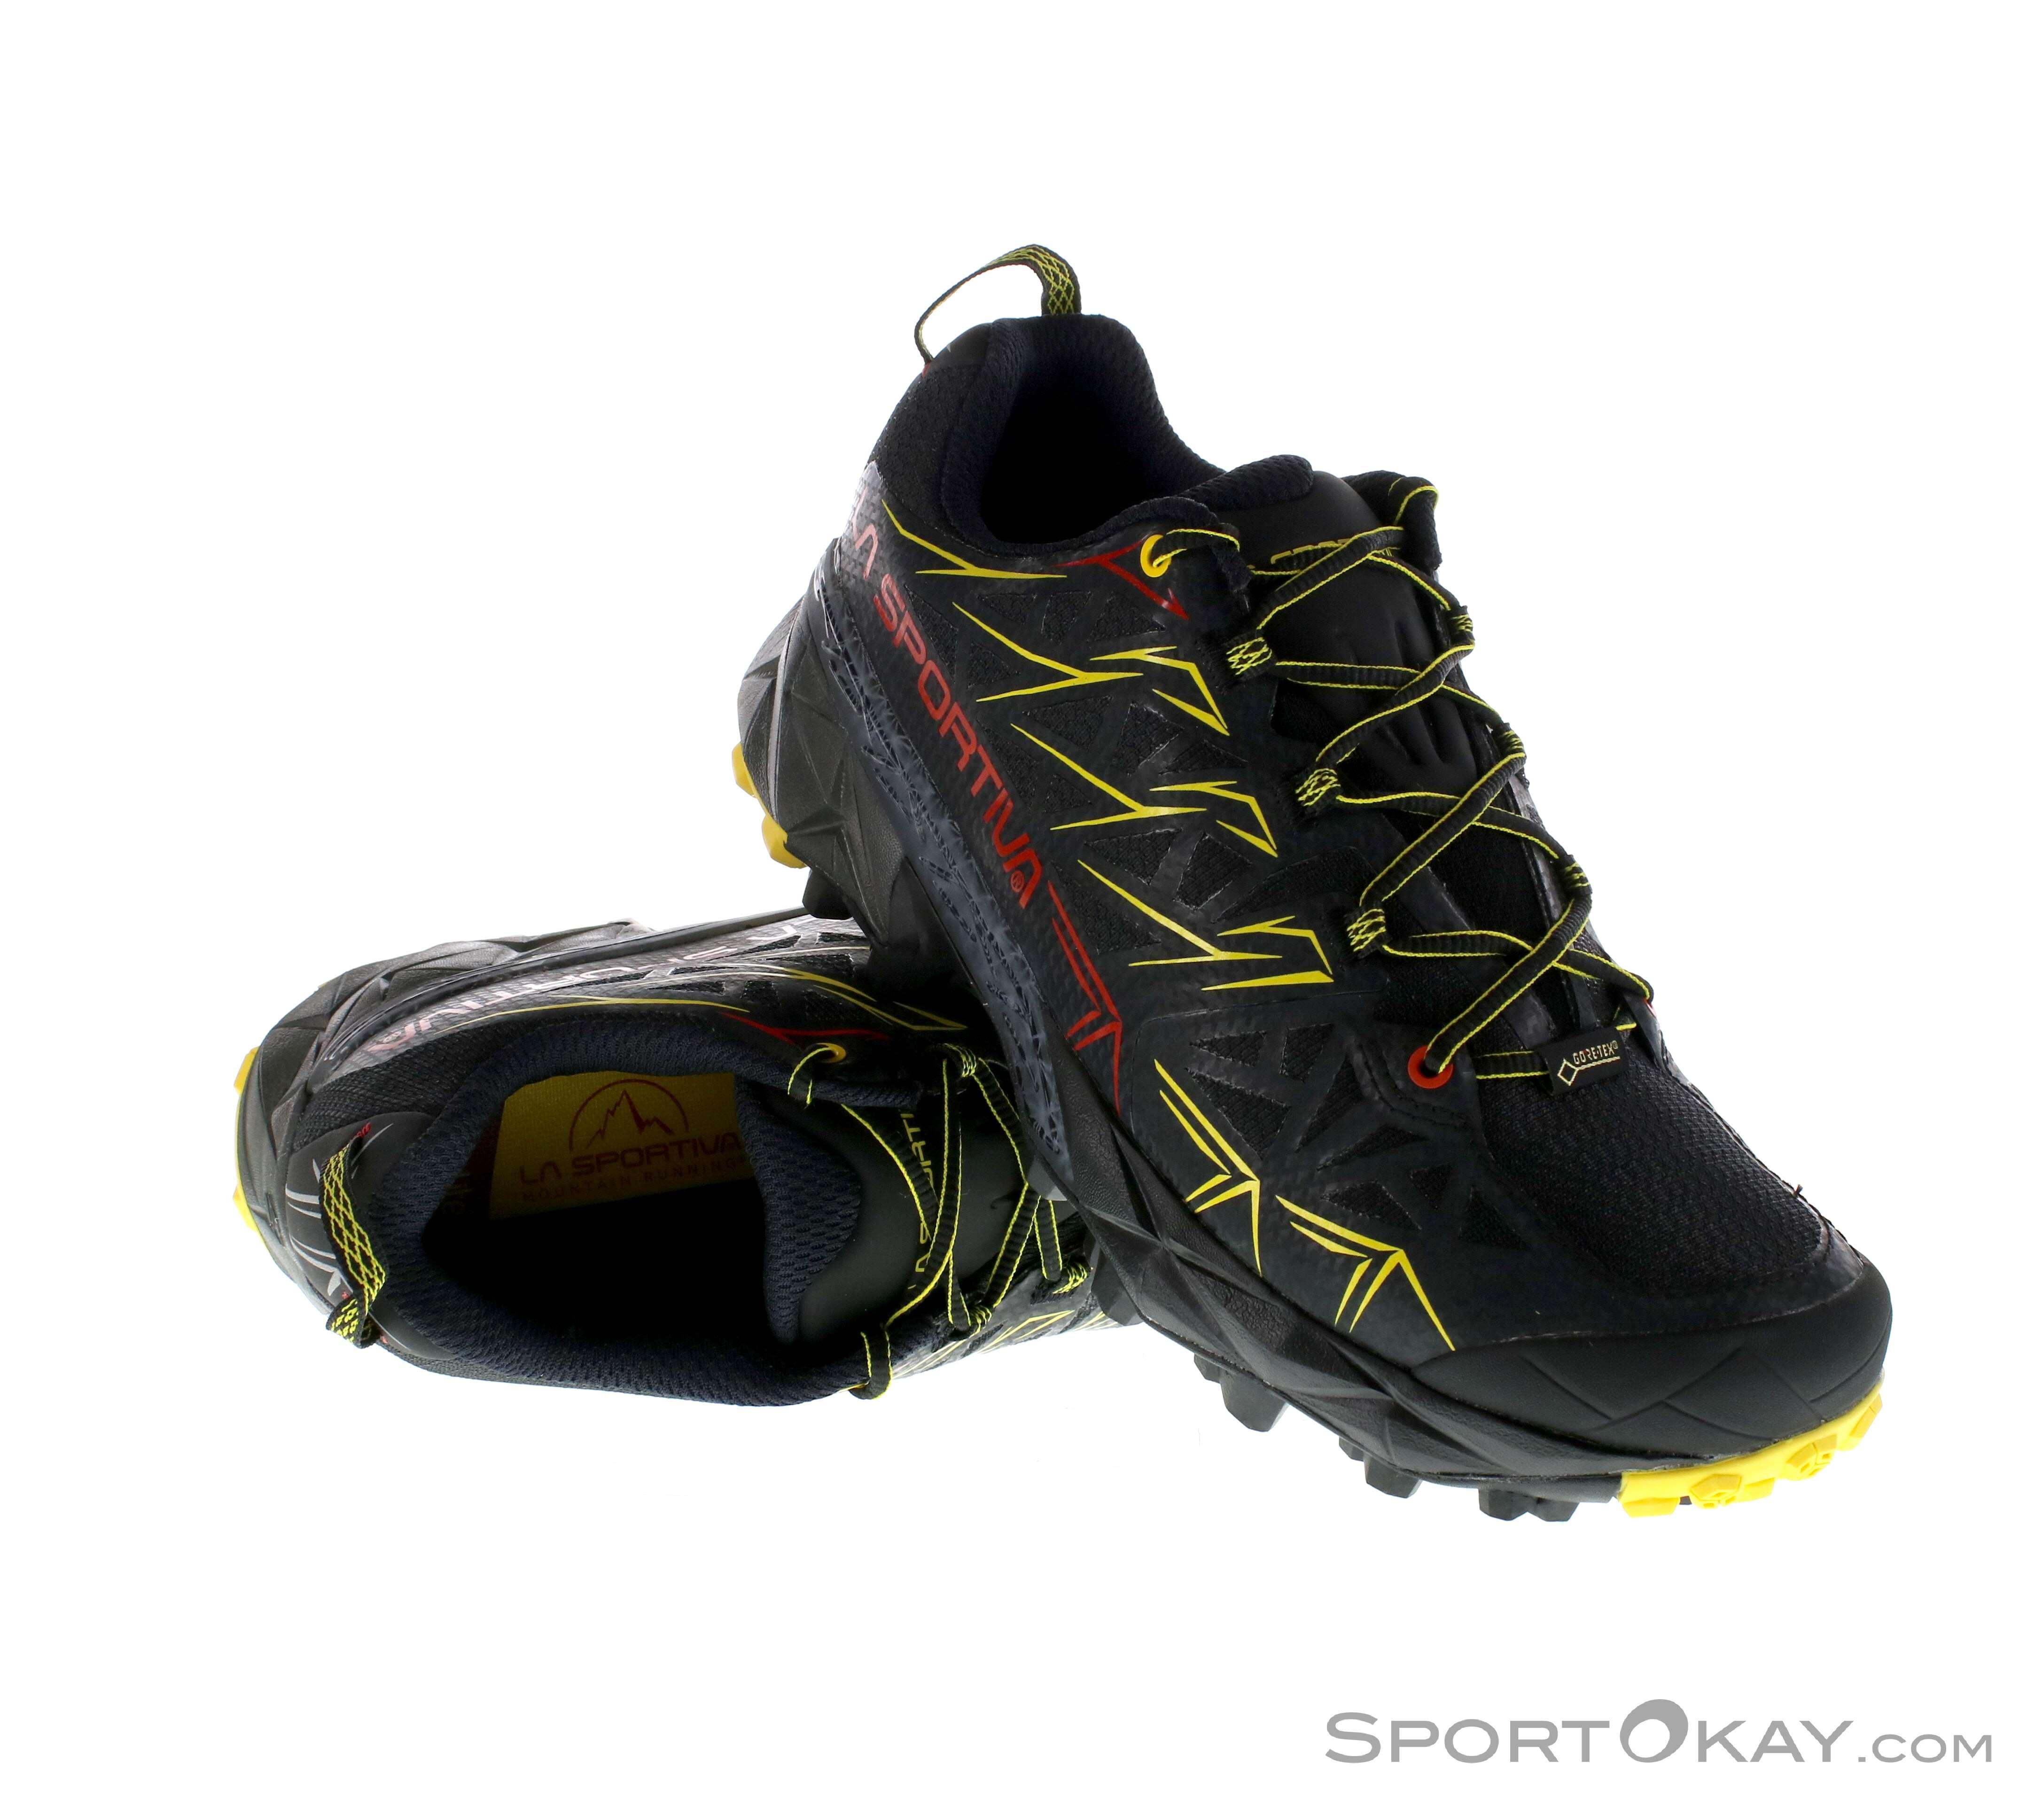 Da Running Gore Sportiva La Scarpe Uomo Trail Tex Akyra Gtx RXwaf